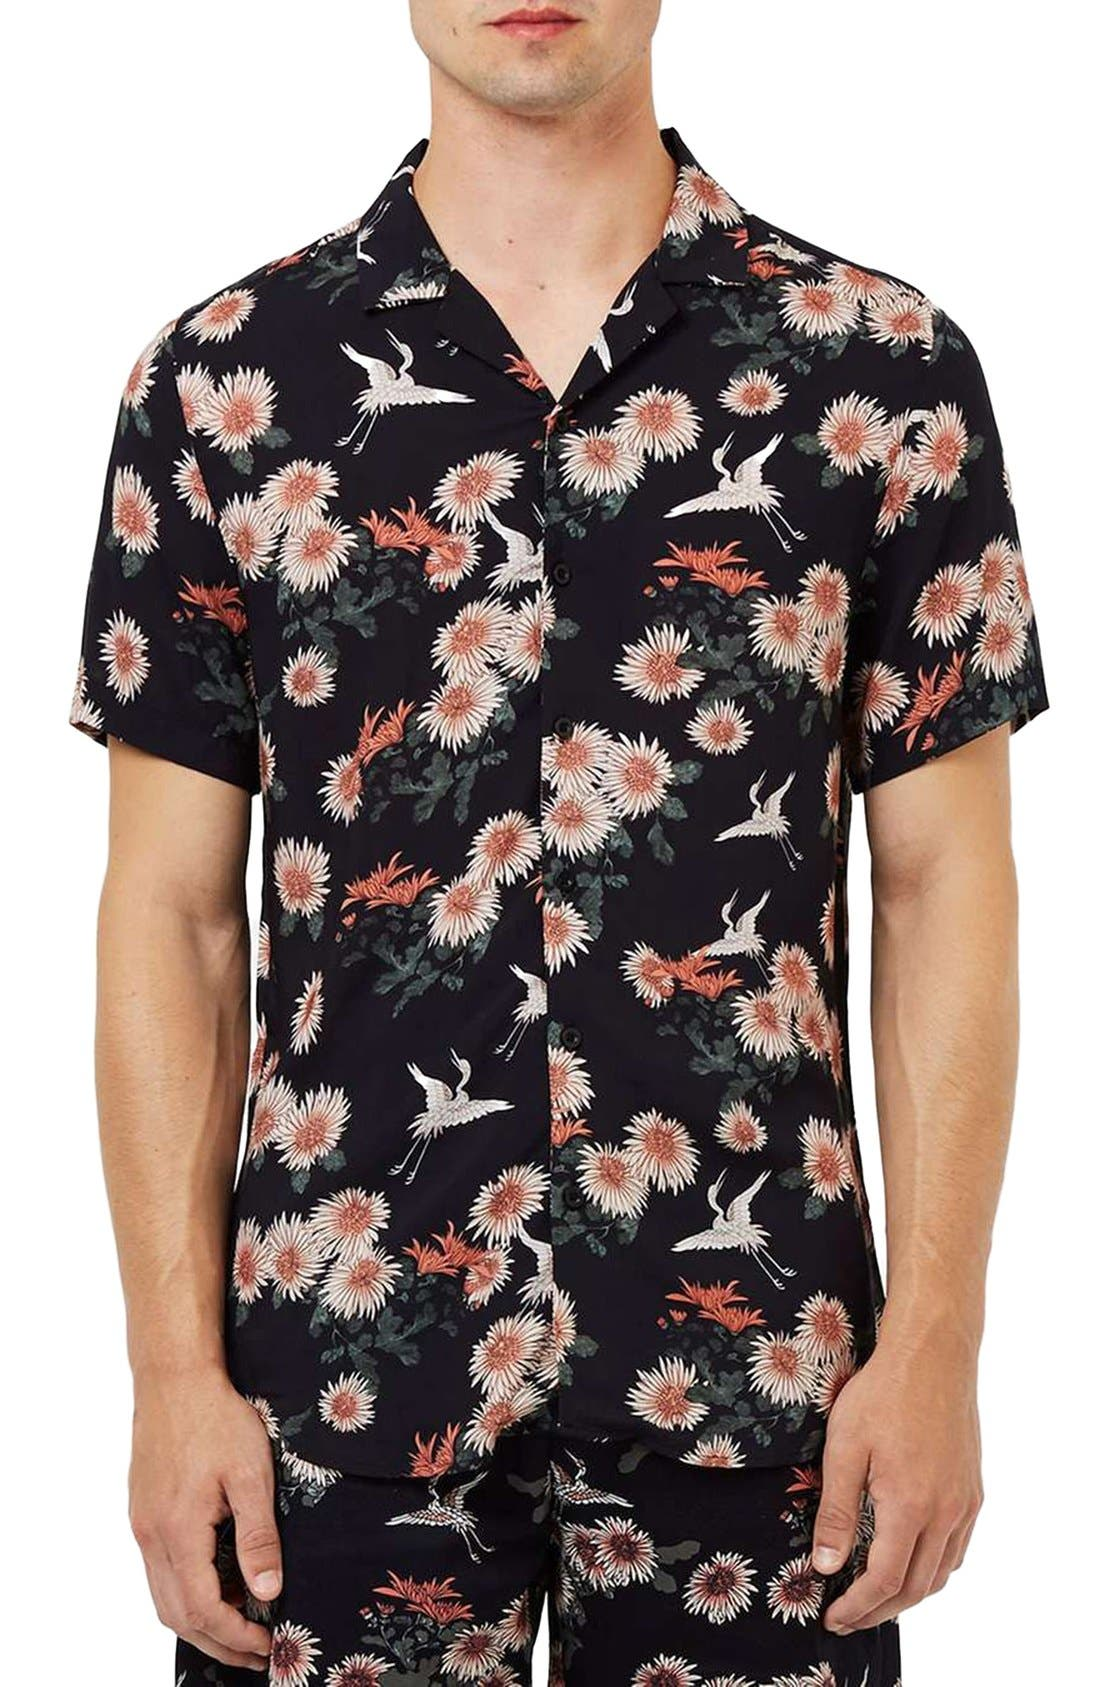 Floral Print Revere Collar Short Sleeve Shirt, Main, color, 001